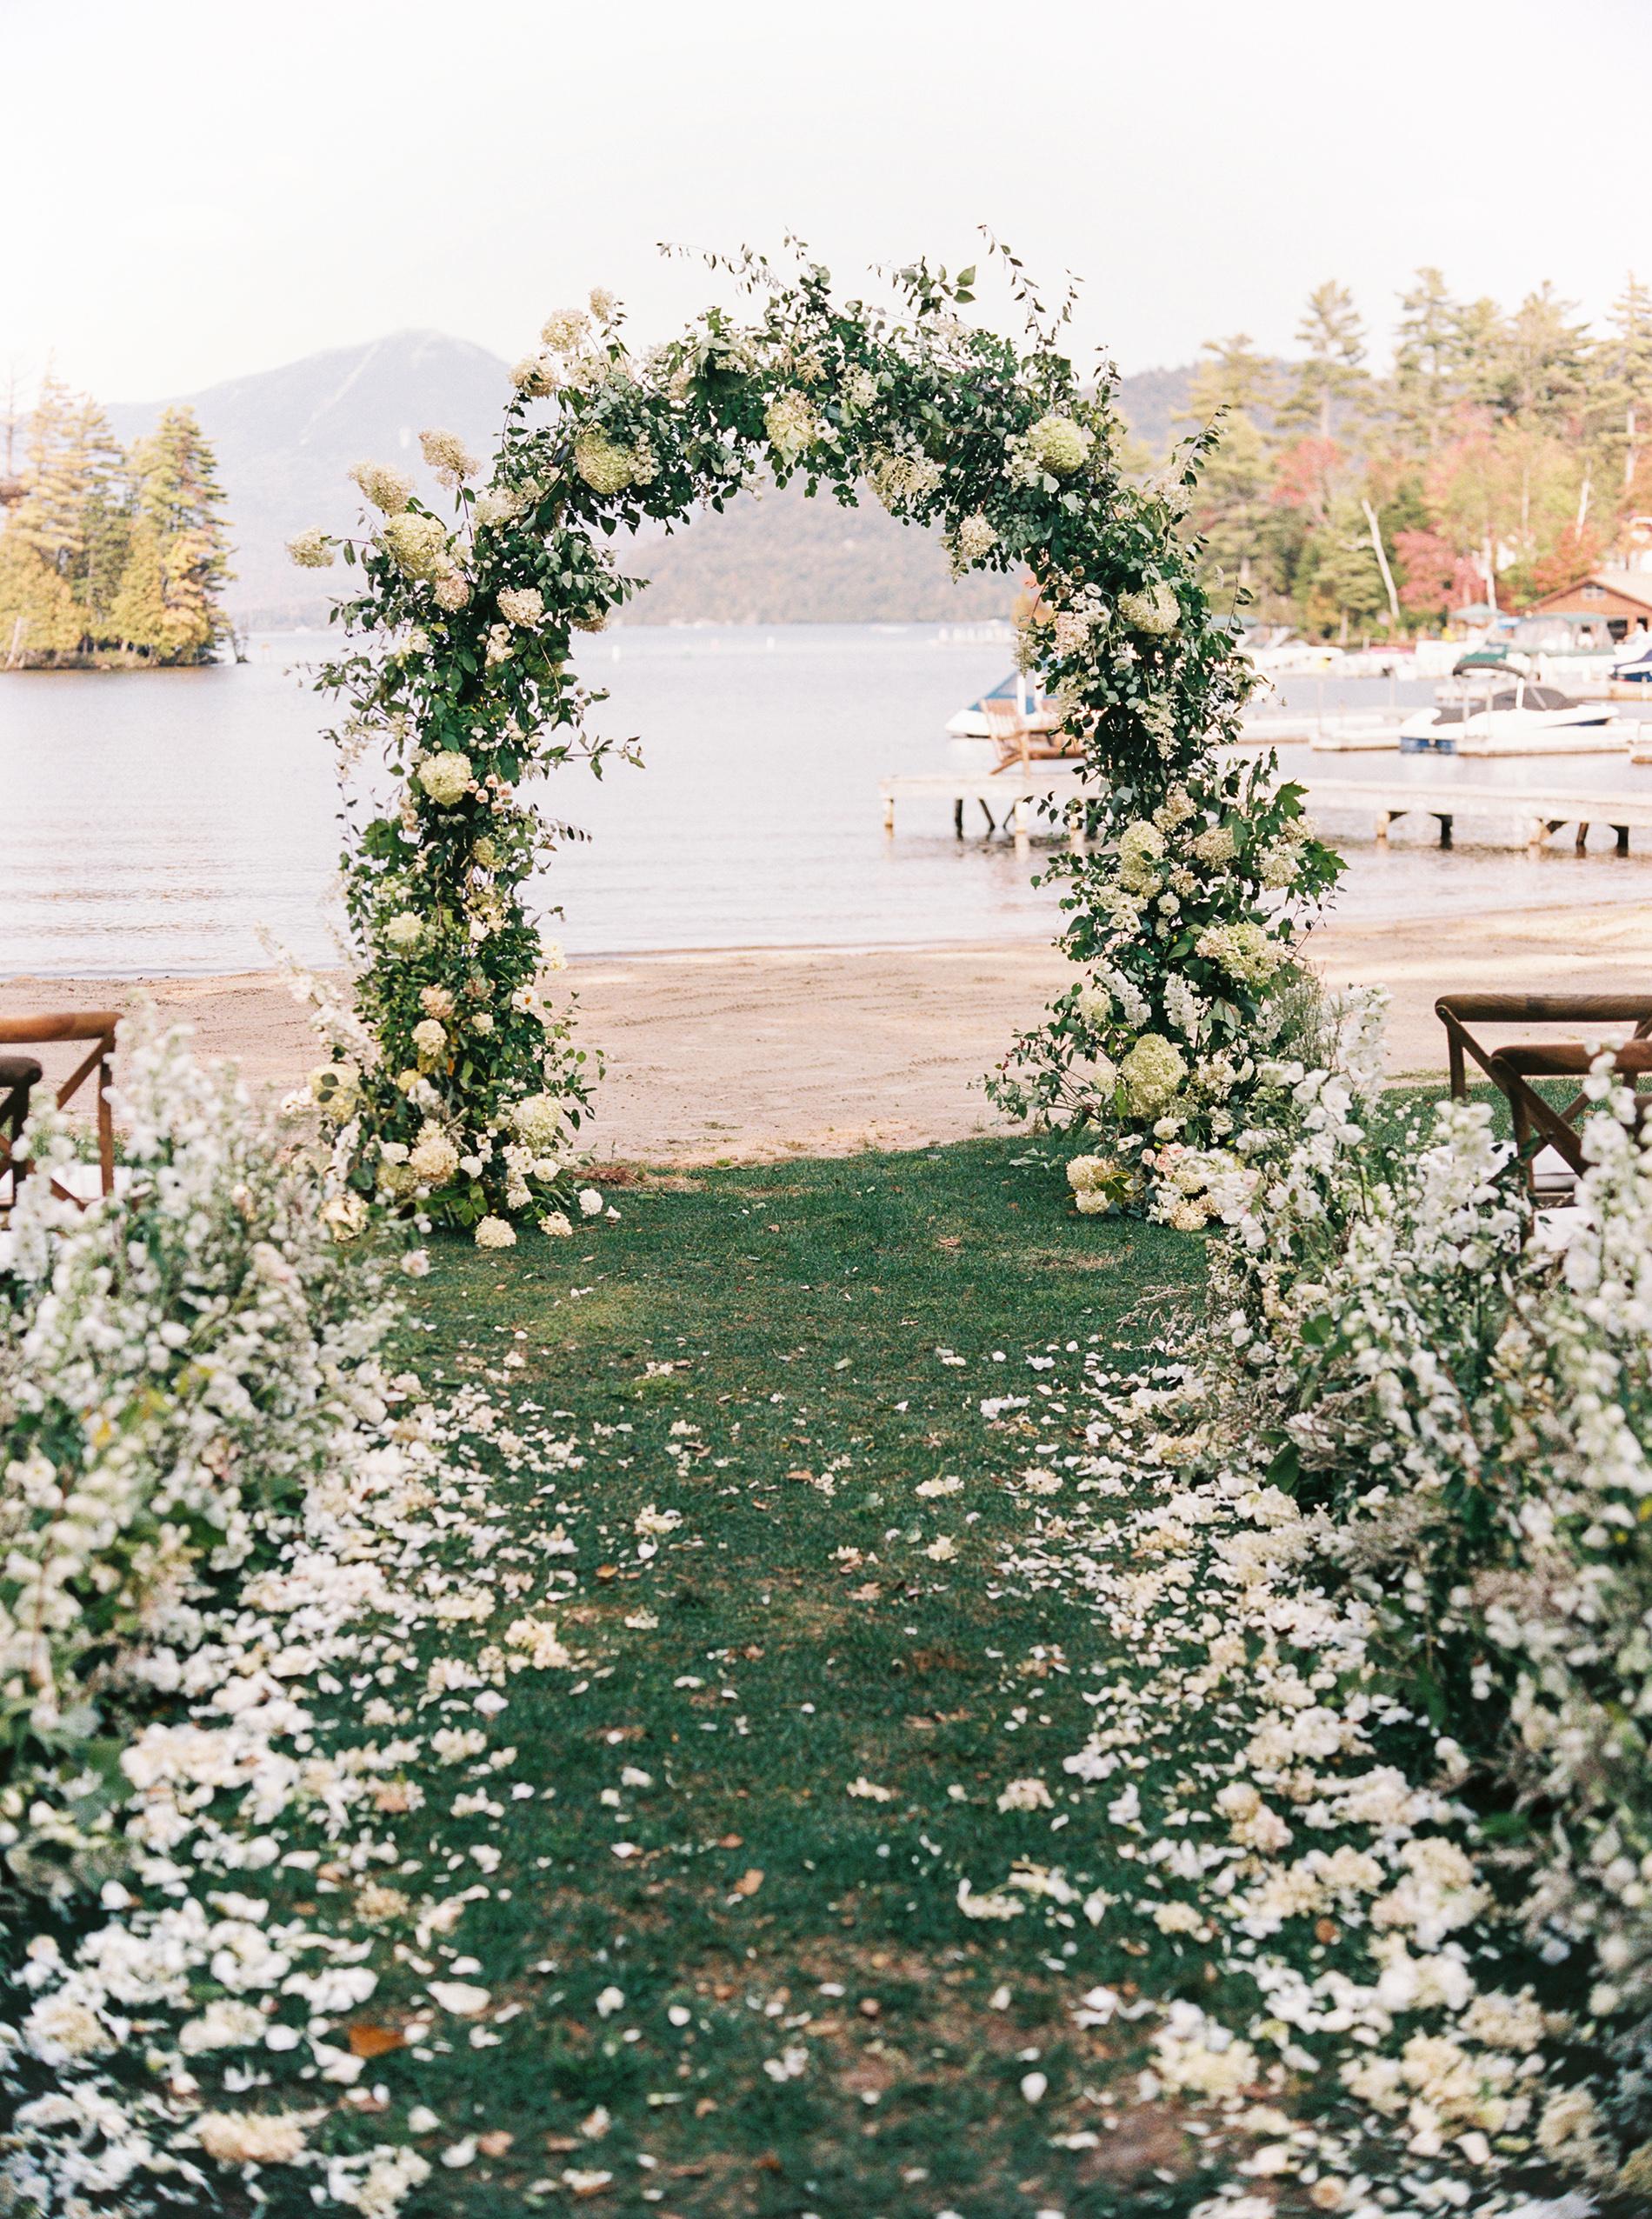 tory sean wedding lake placid new york ceremony arch